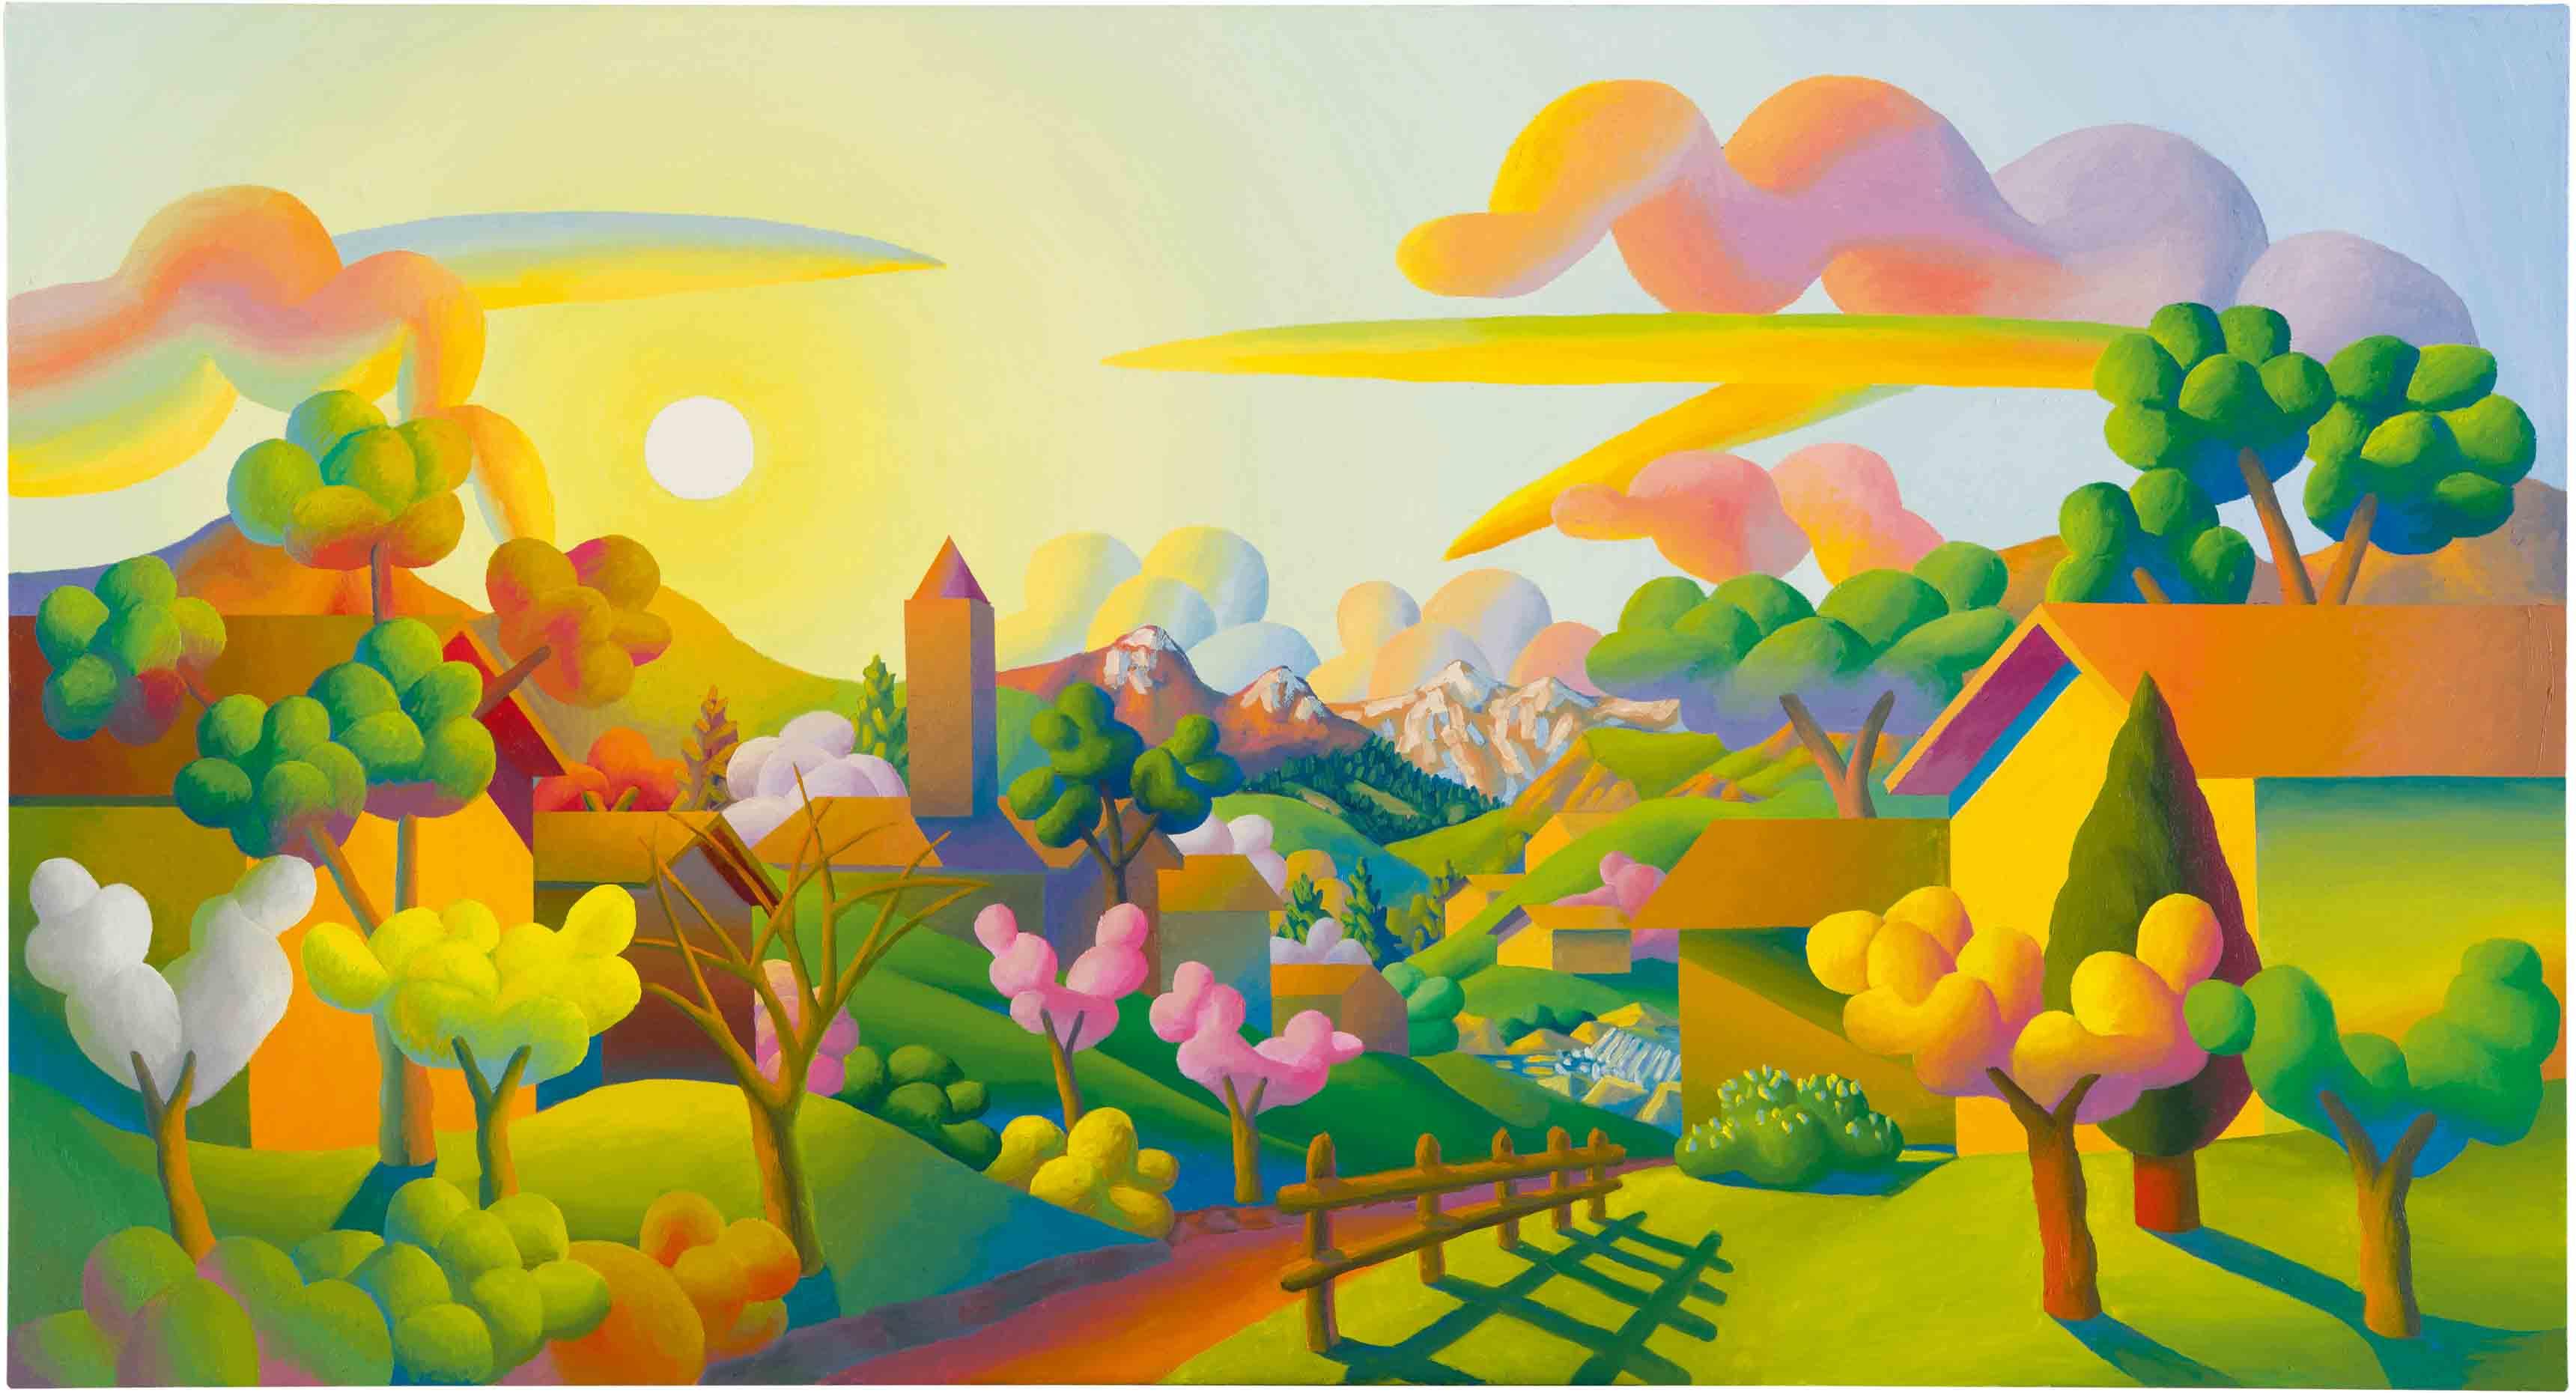 """Di Primavera"" (2014), de Salvo, huile sur toile, 120 x 220 cm. Collection privée."